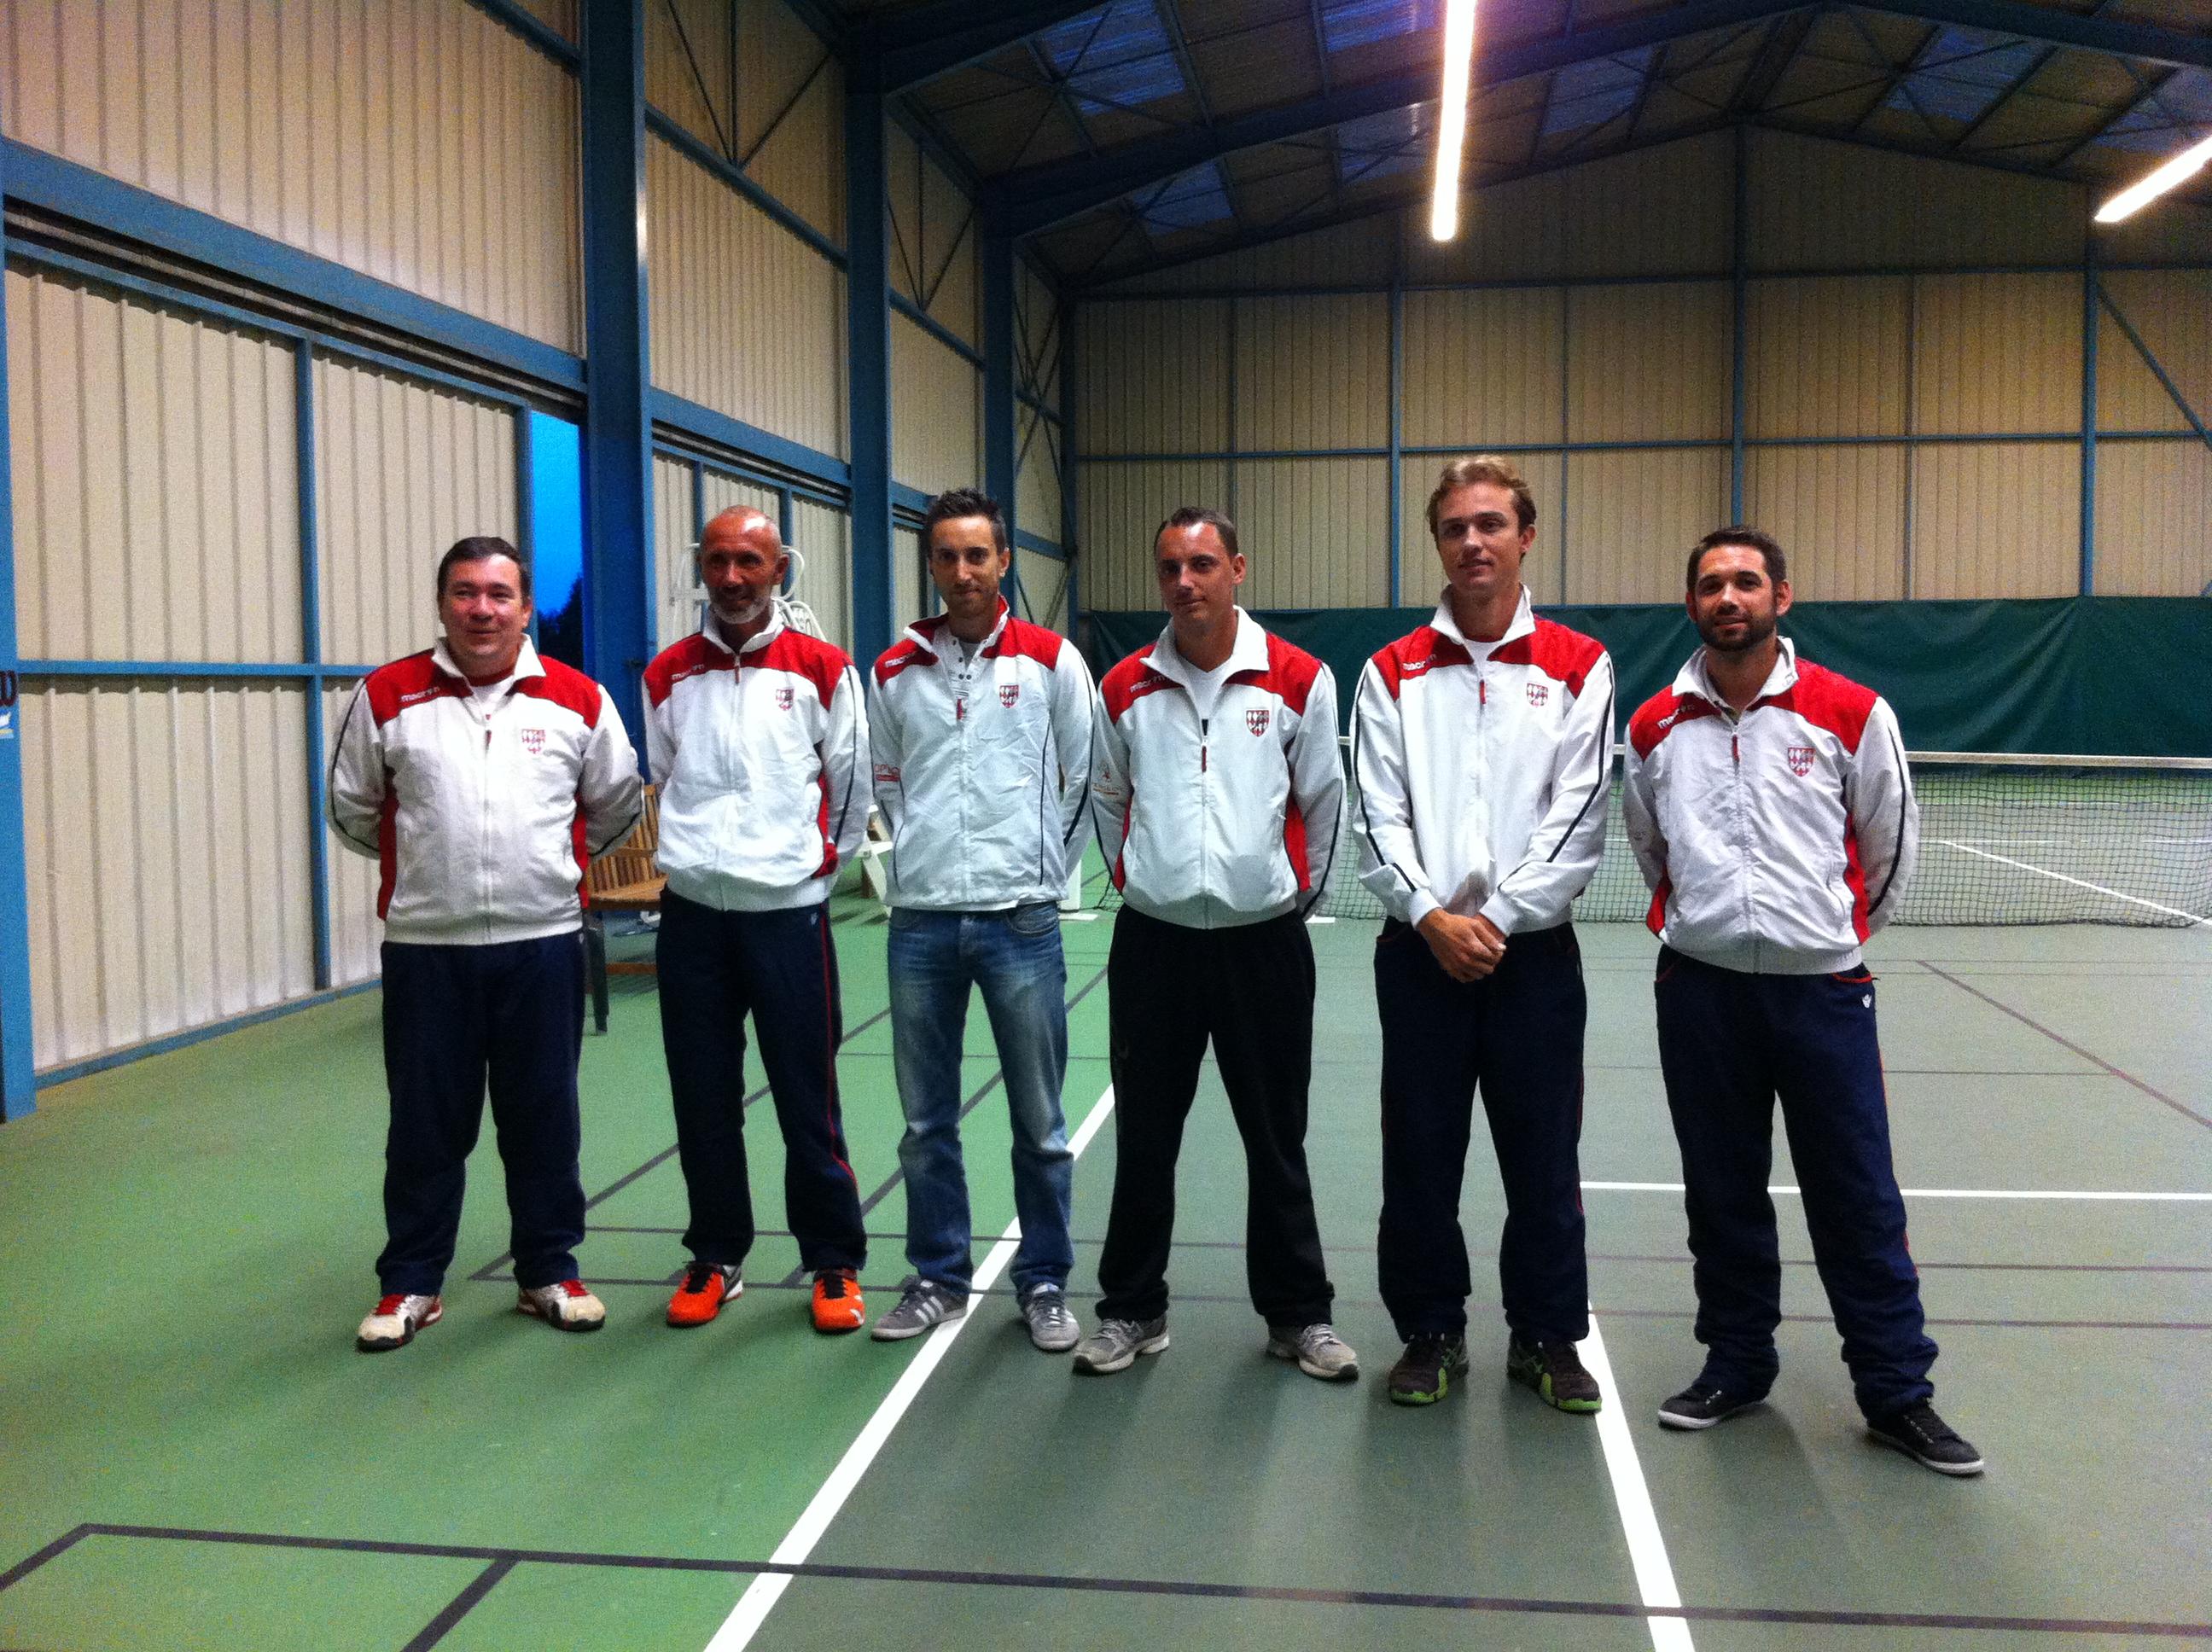 Le président Eric Joris et les enseignants Franck, Thomas, Christophe, Mickael et Jonathan